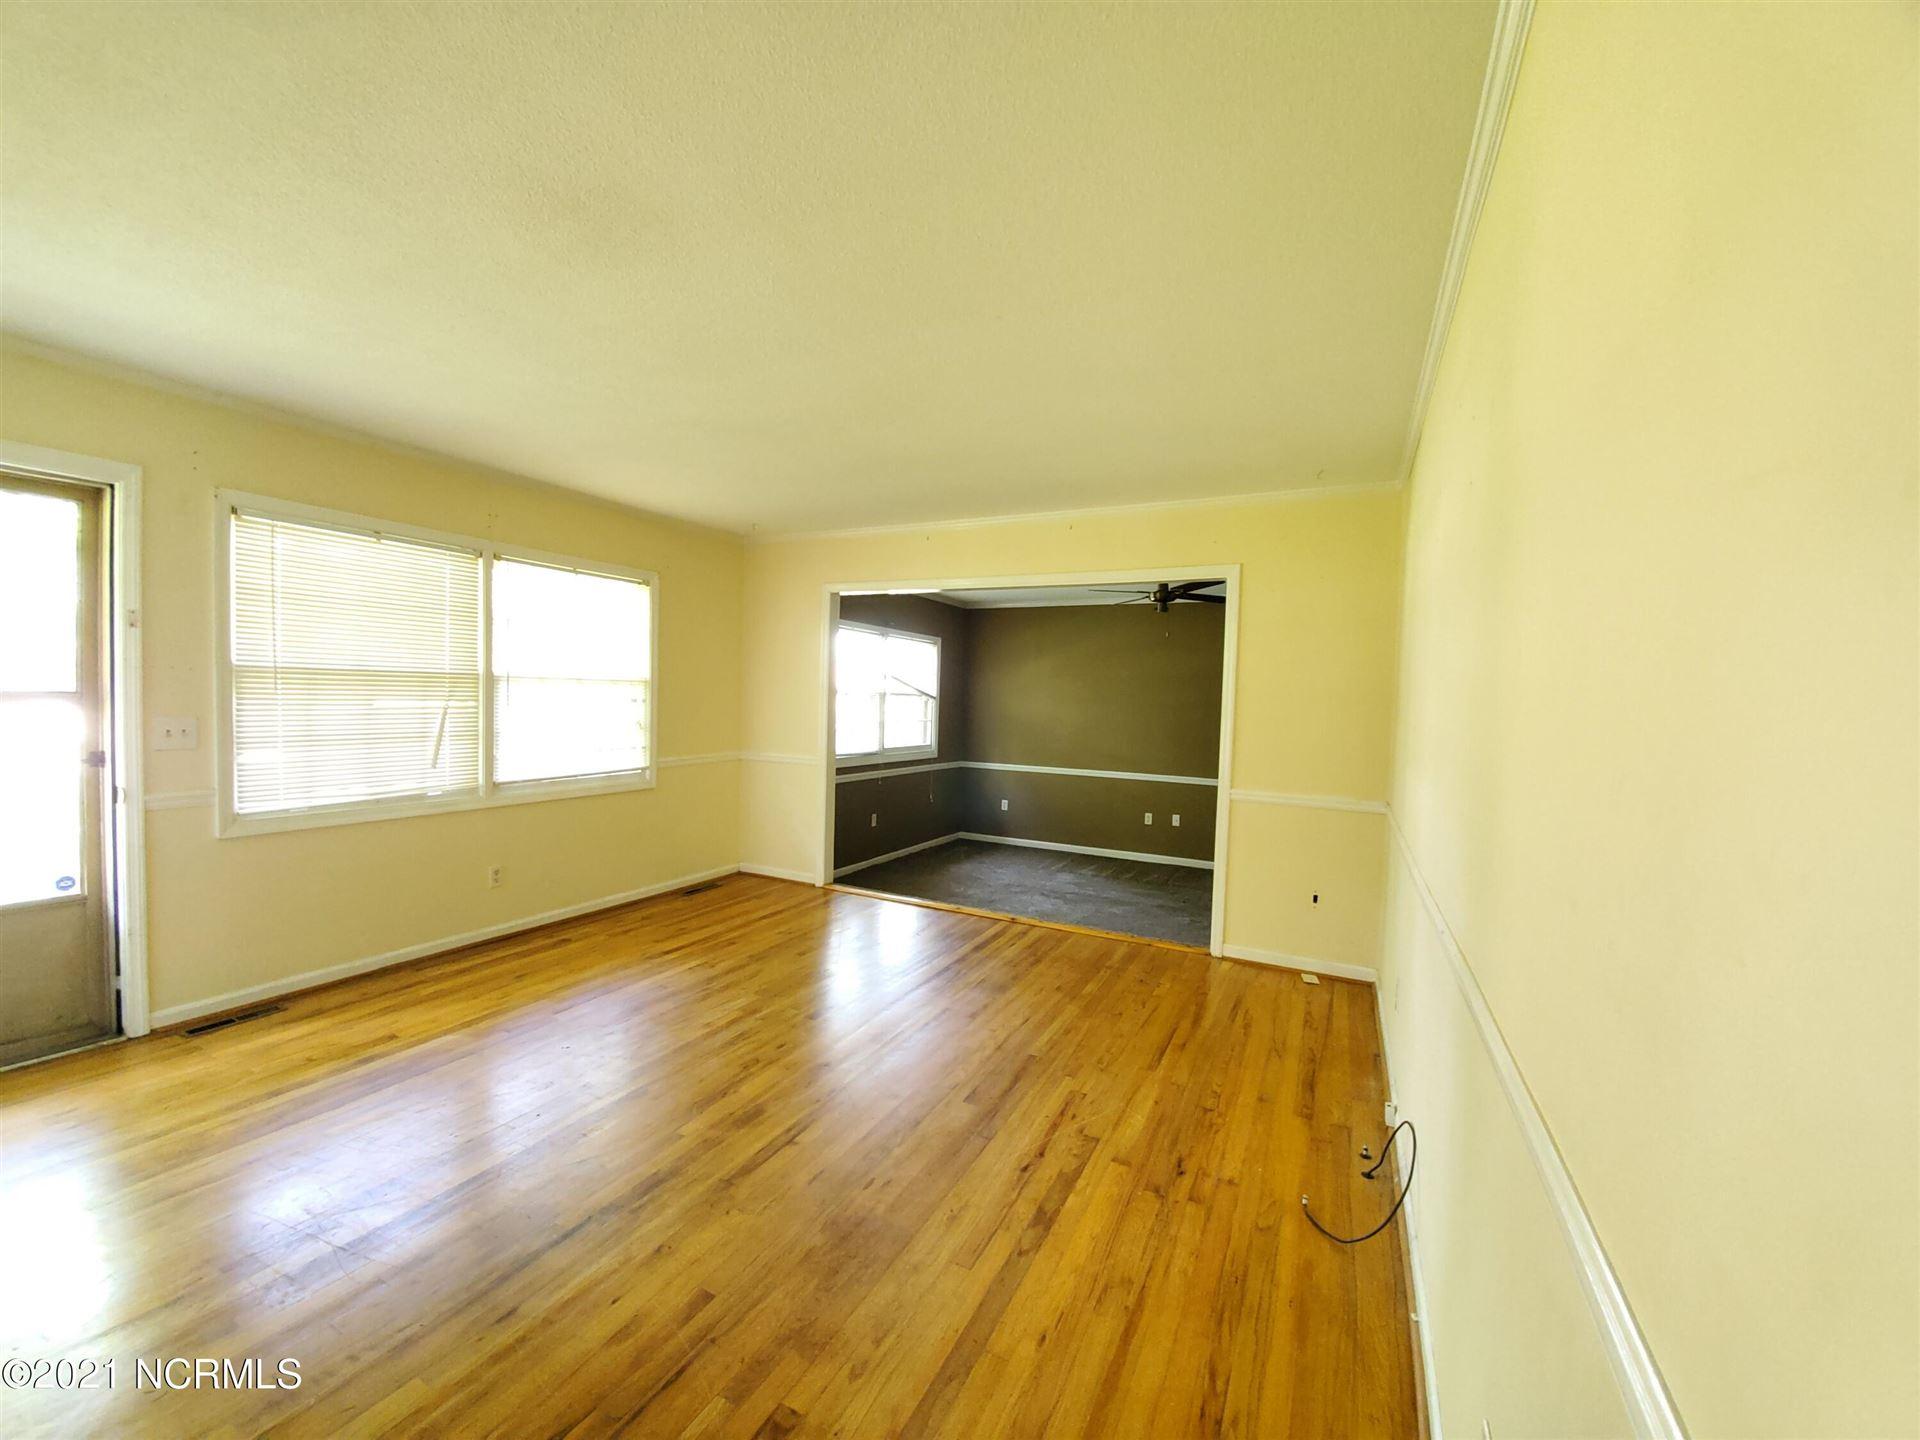 Photo of 620 Sunrise Park Drive, Ayden, NC 28513 (MLS # 100291102)